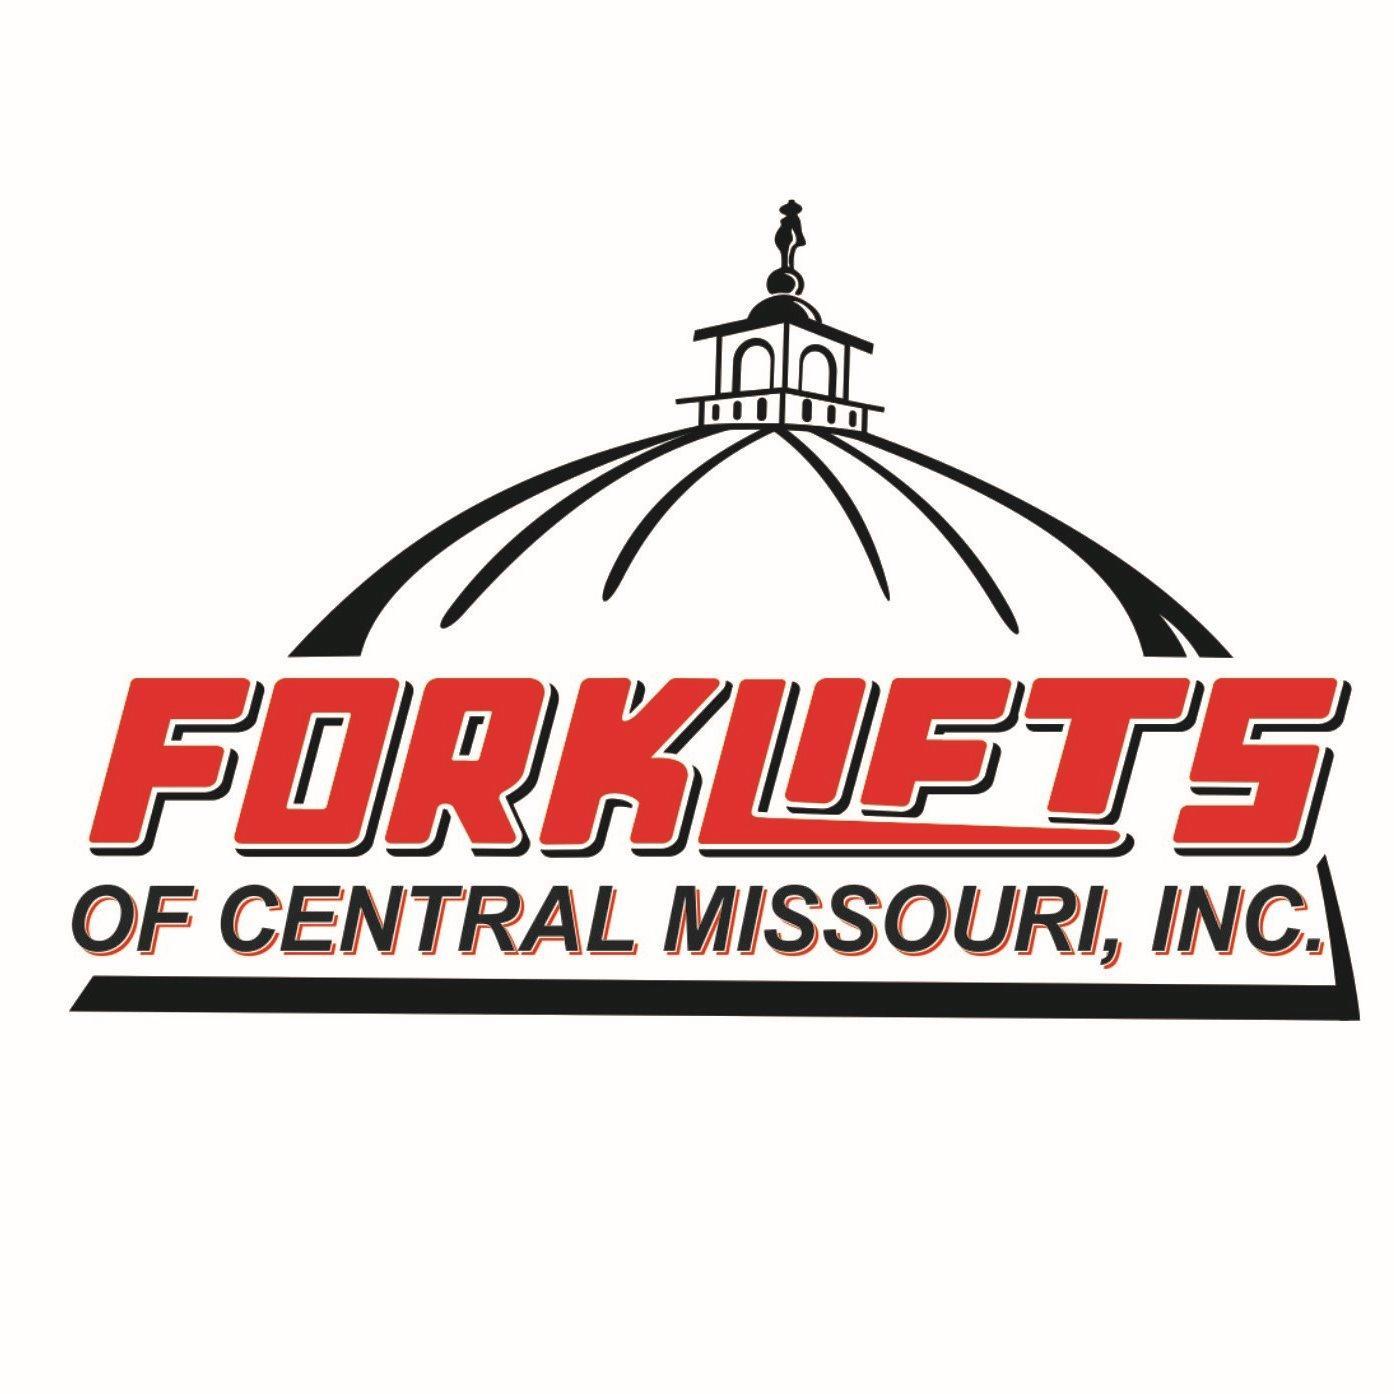 Forklifts of Central Missouri